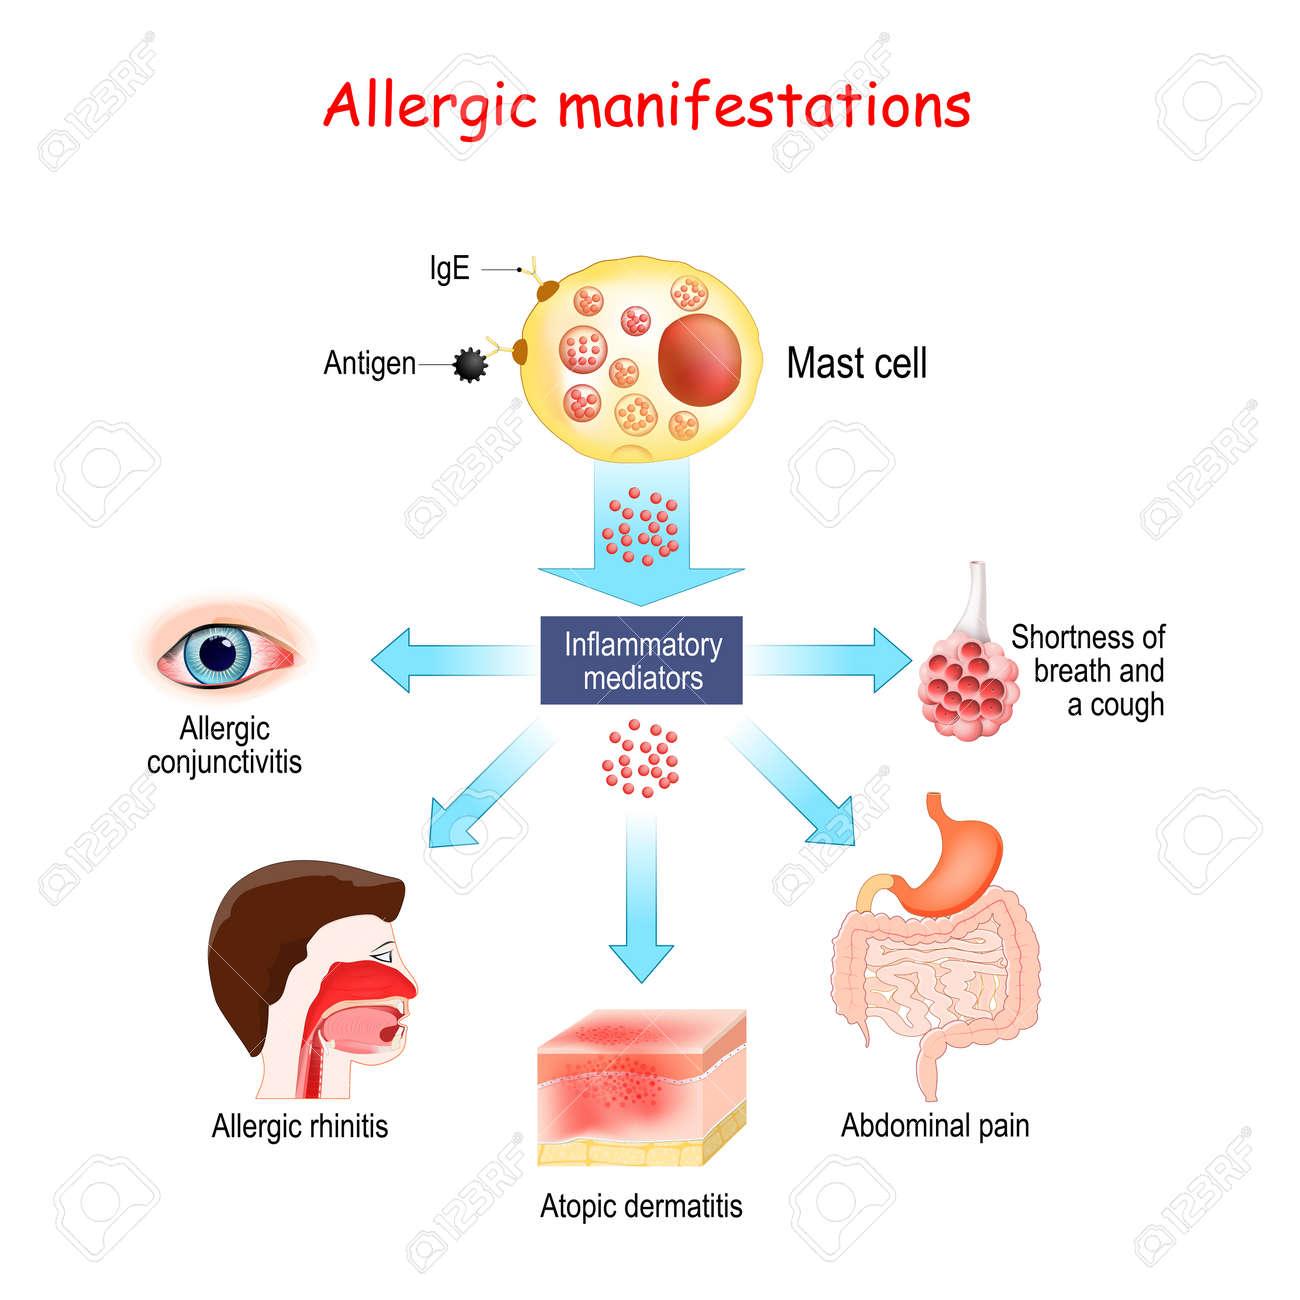 Food allergy and Allergic manifestations. Mast cell and Inflammatory mediators. Allergic conjunctivitis, atopic dermatitis, allergic rhinitis. Vector illustration. - 172063244